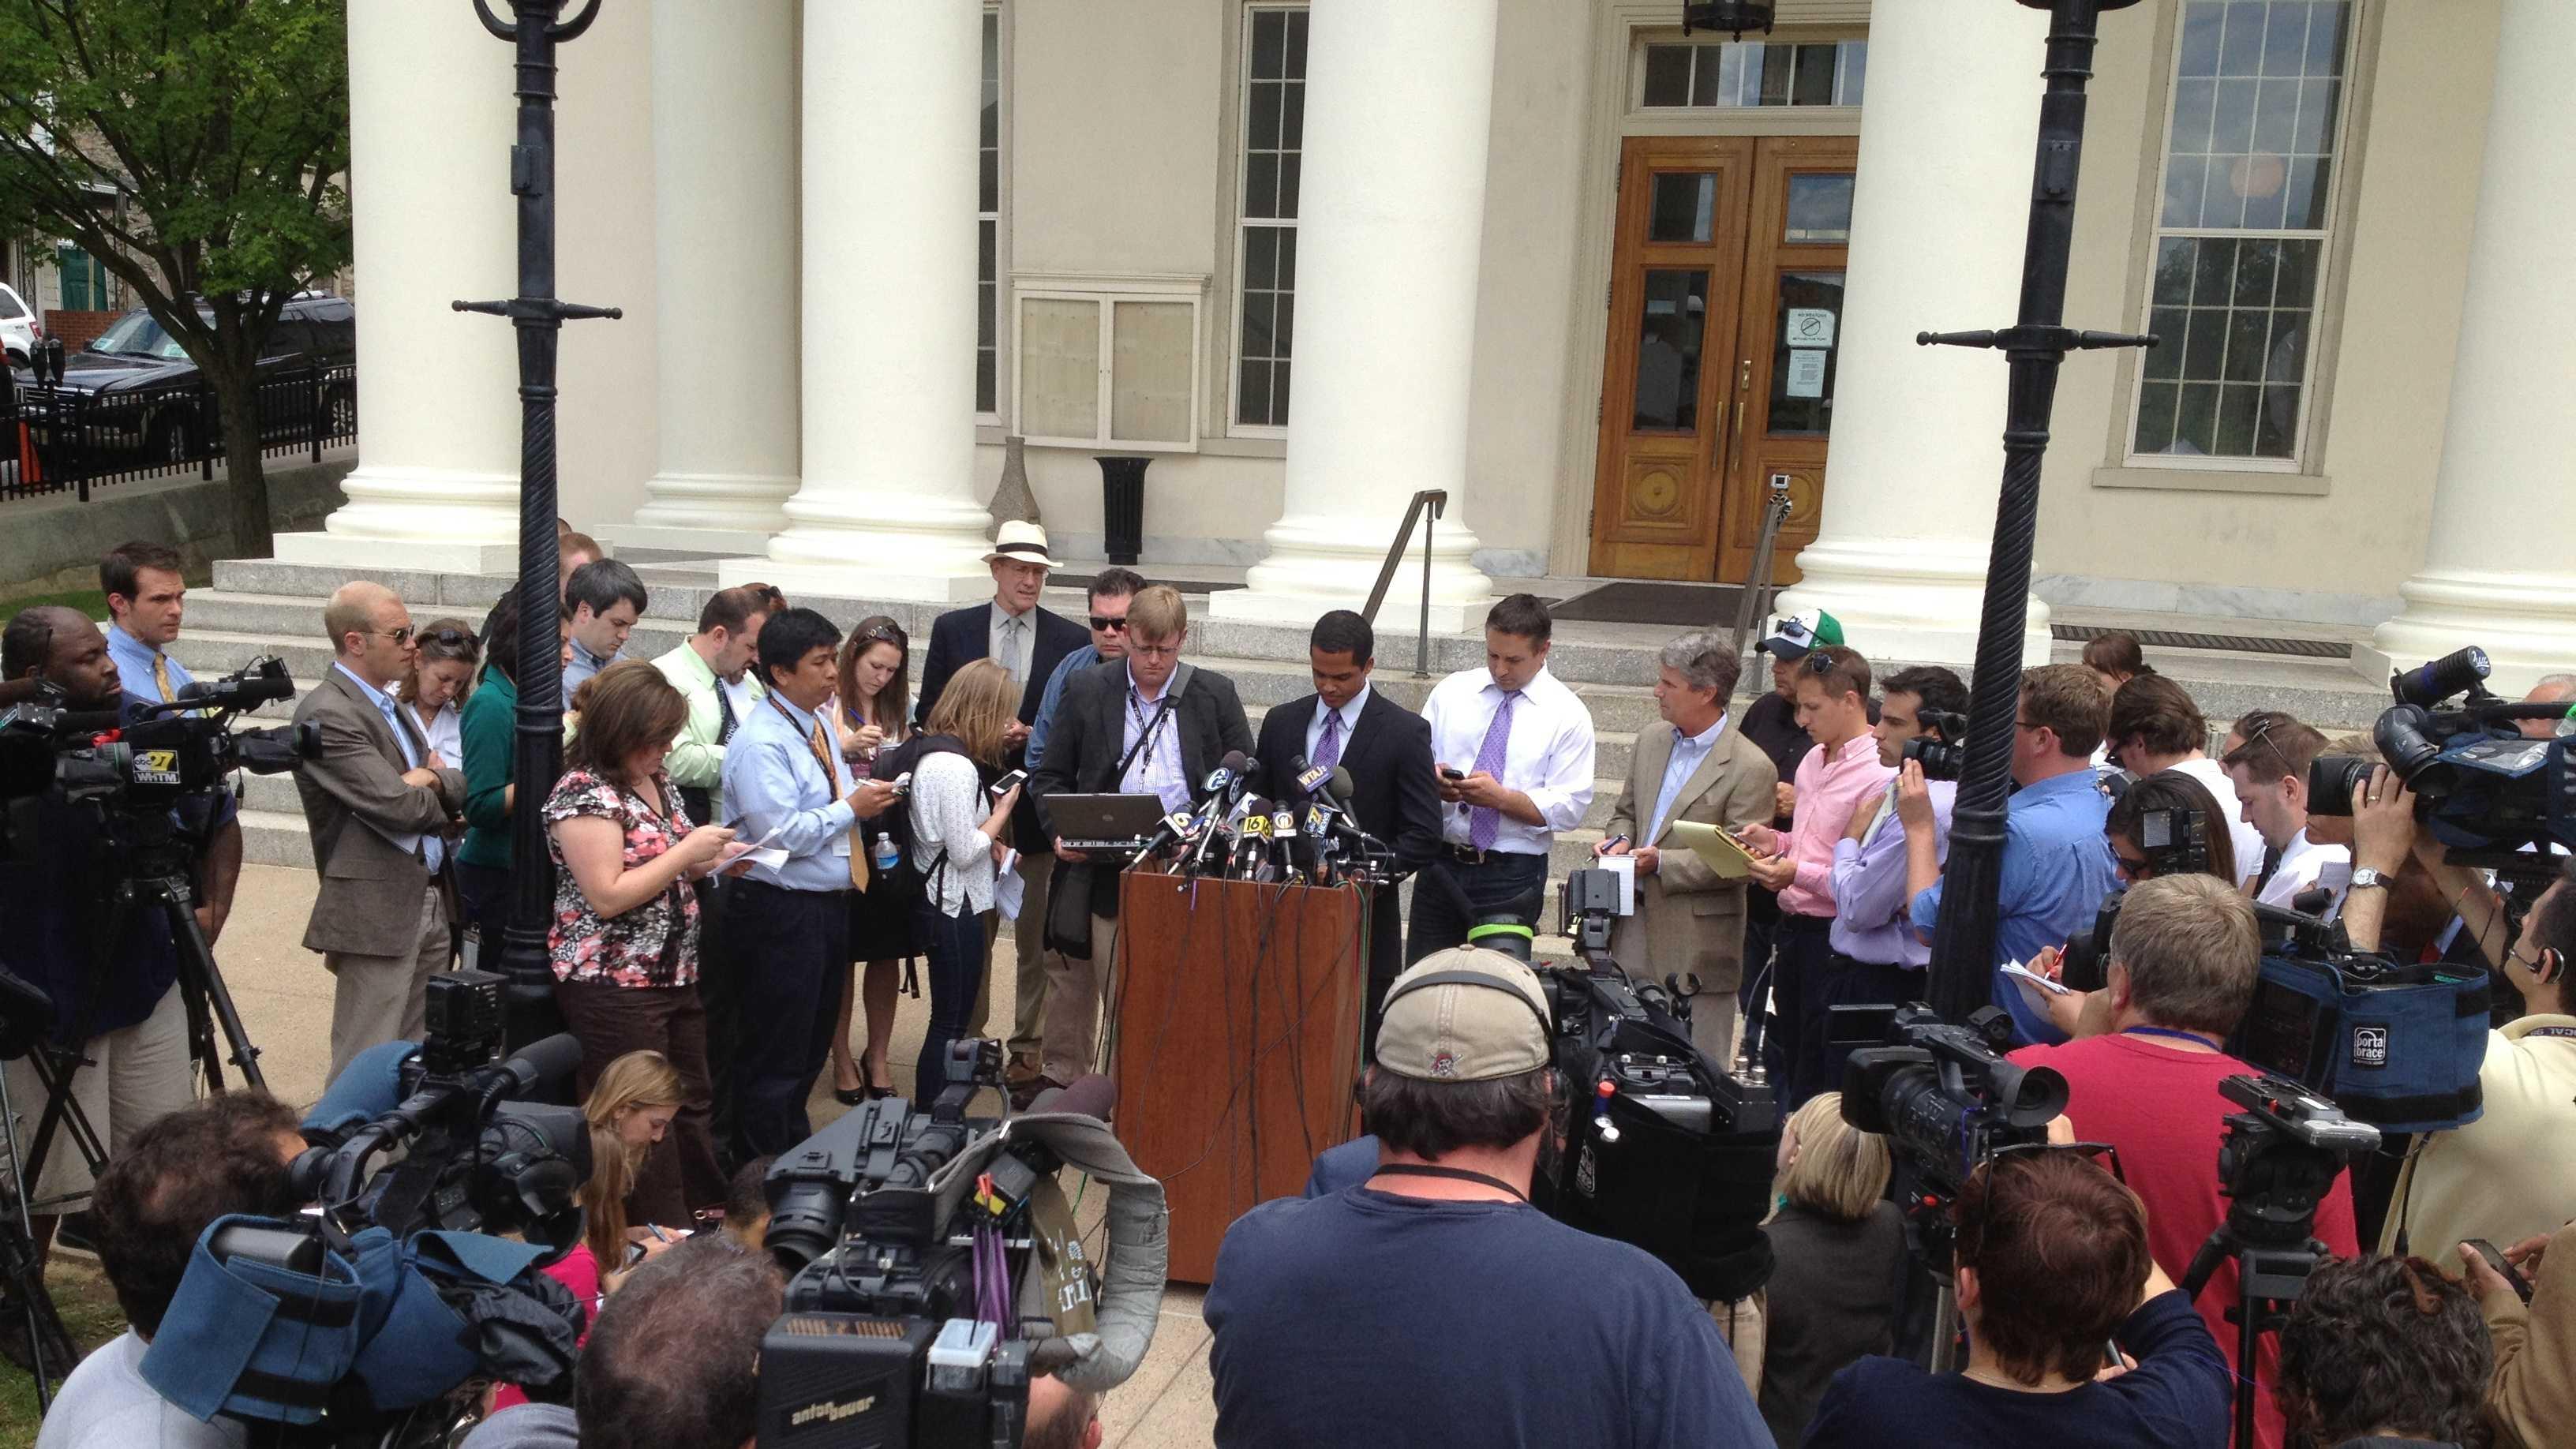 Media update on jury selection